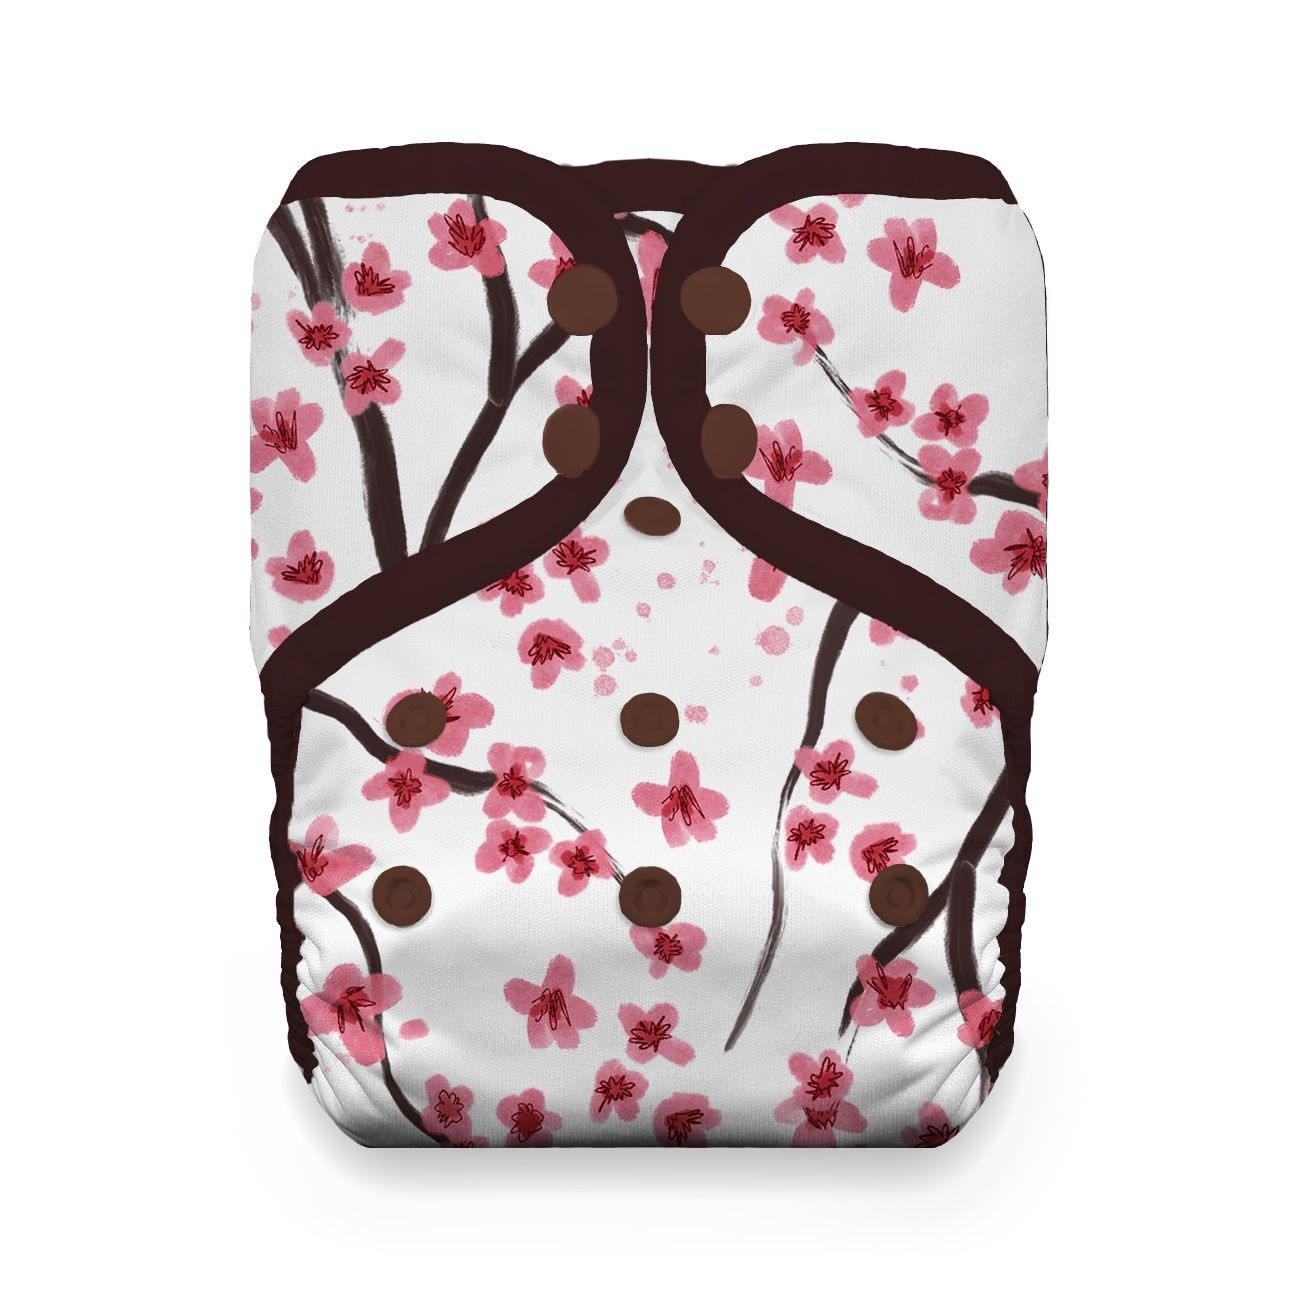 Thirsties Thirsties - One-Size Natural Pocket Snap - Sakura